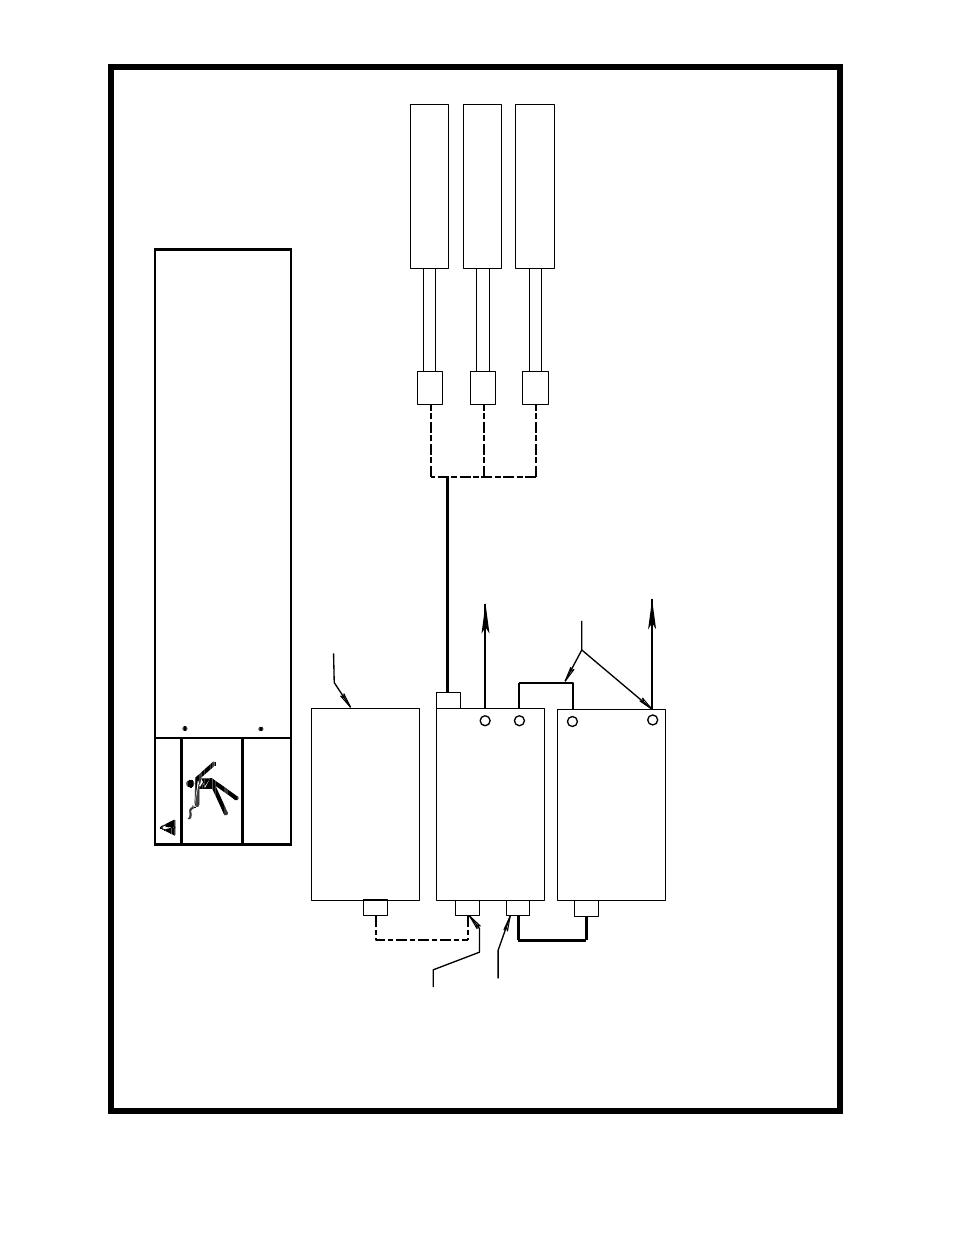 medium resolution of lincoln k870 wiring diagram cool wiring diagrams lincoln k870 wiring diagram